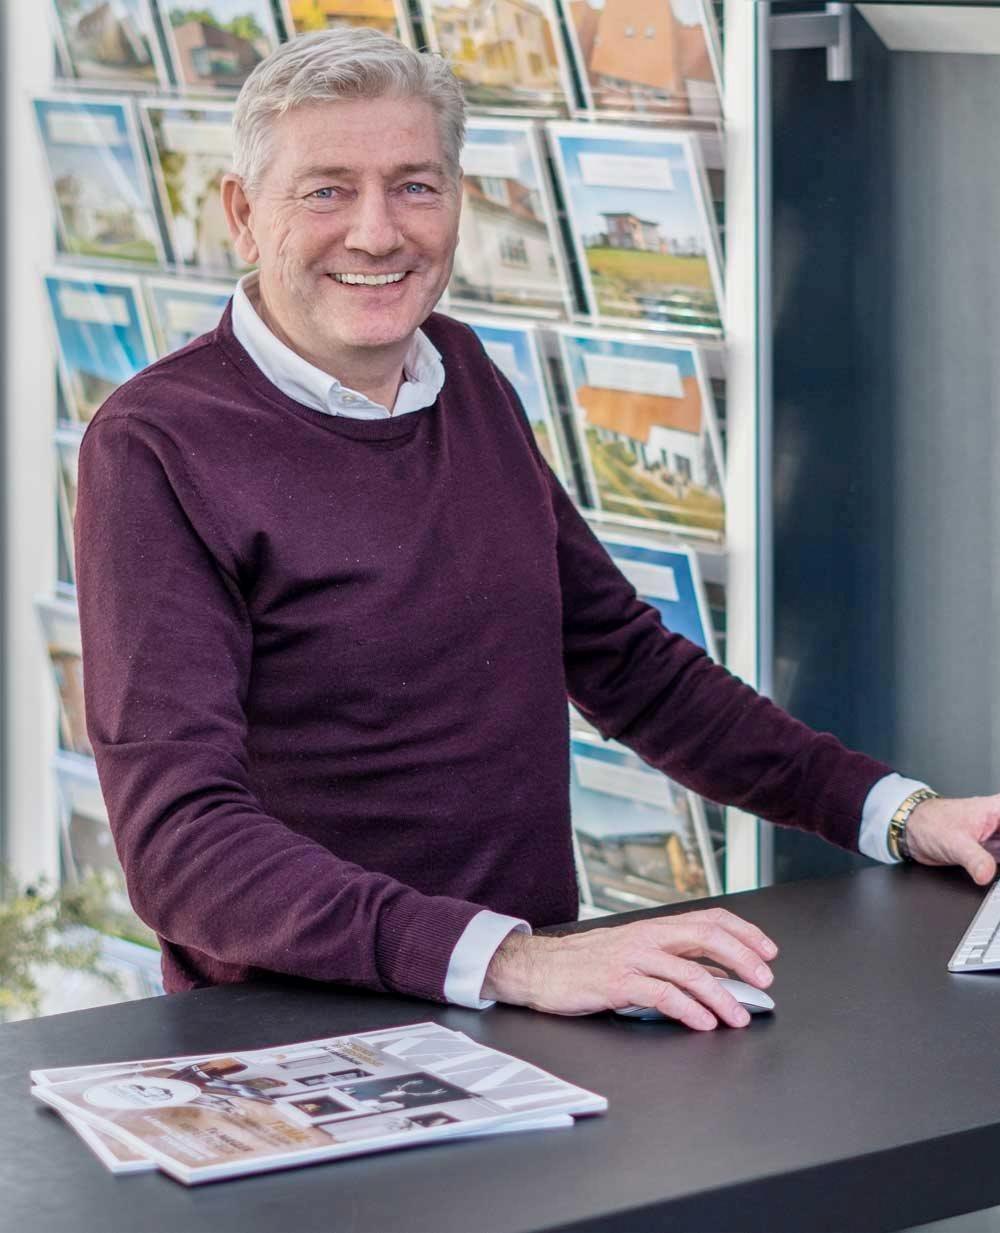 Allan Nørgaard